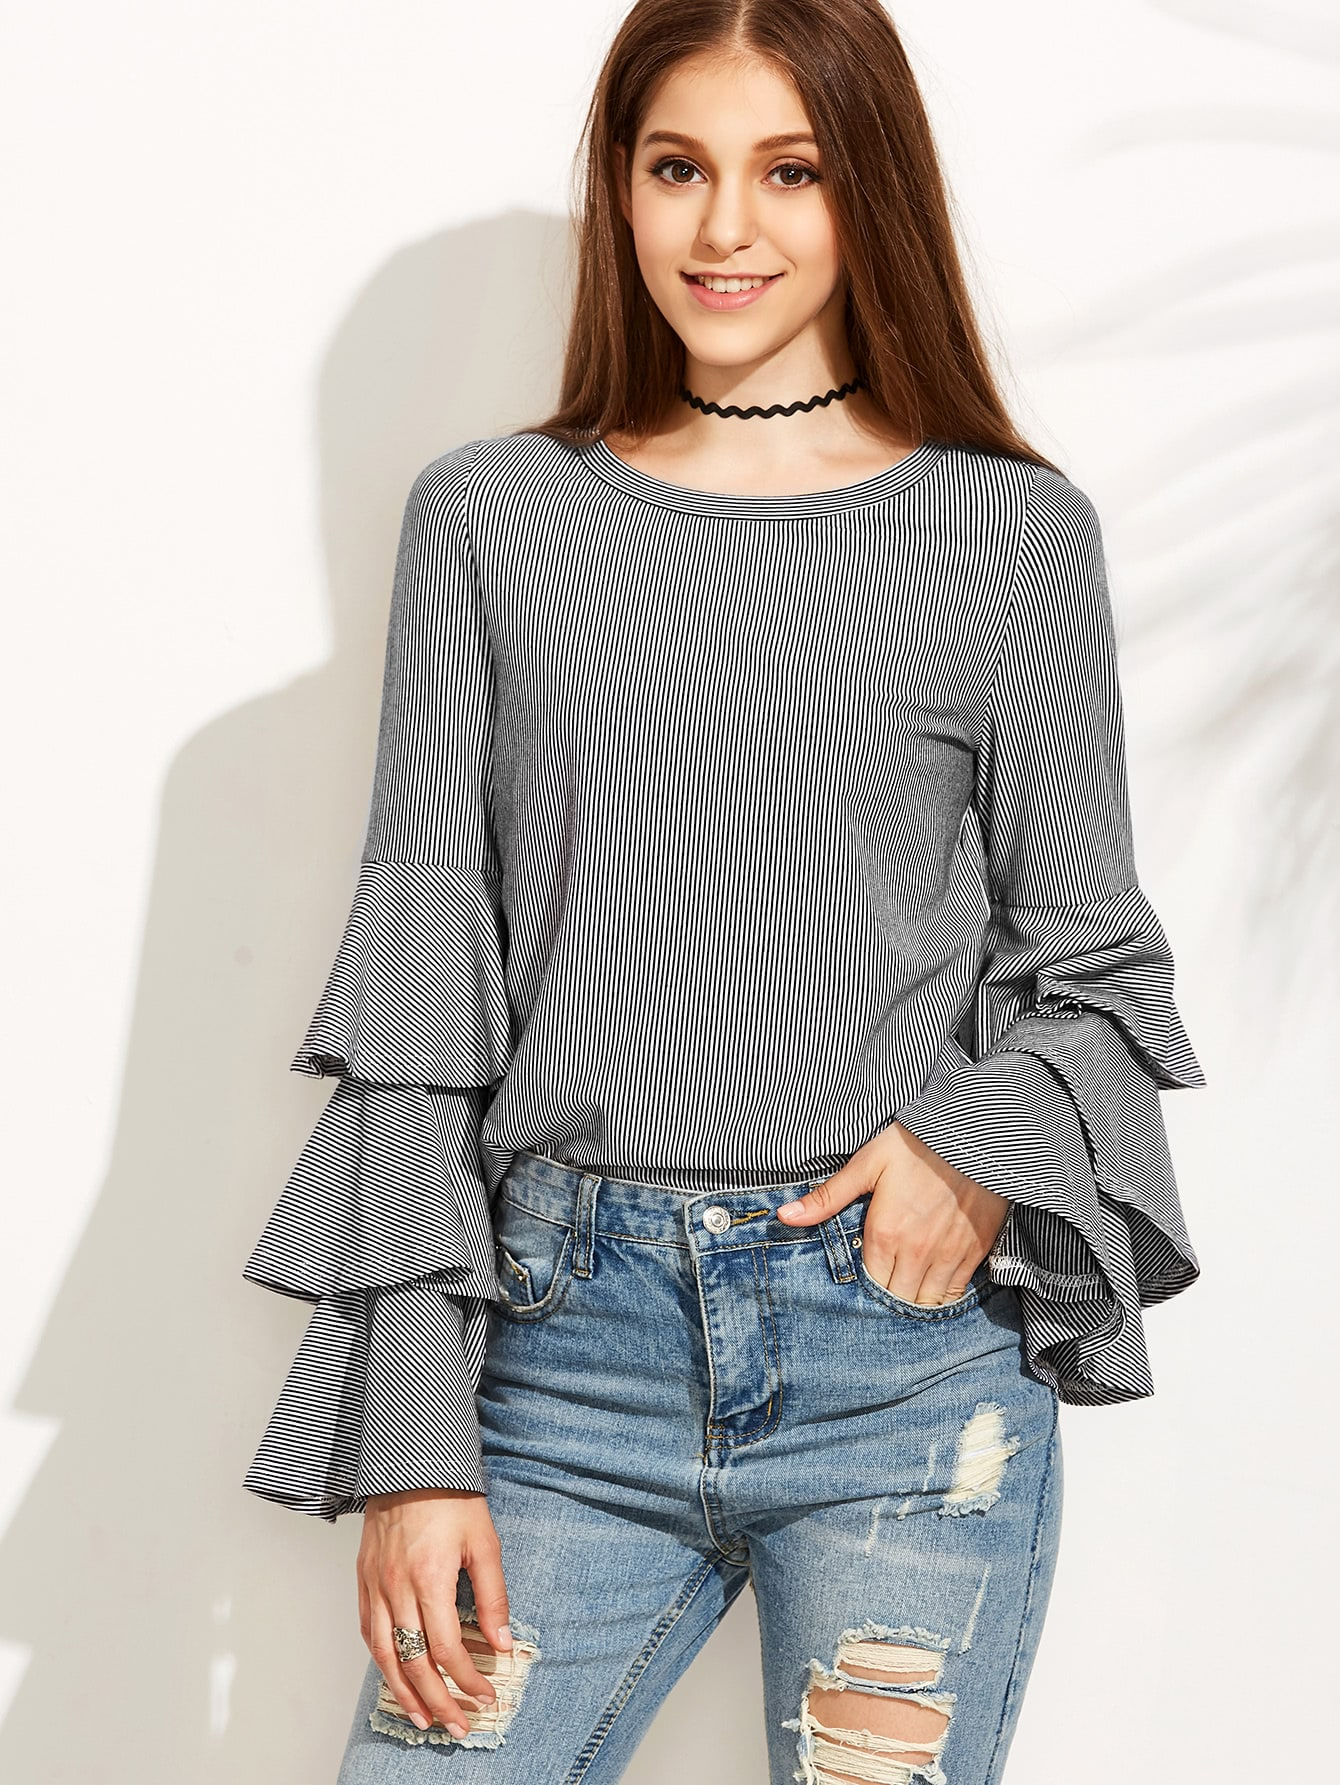 blouse160809701_2